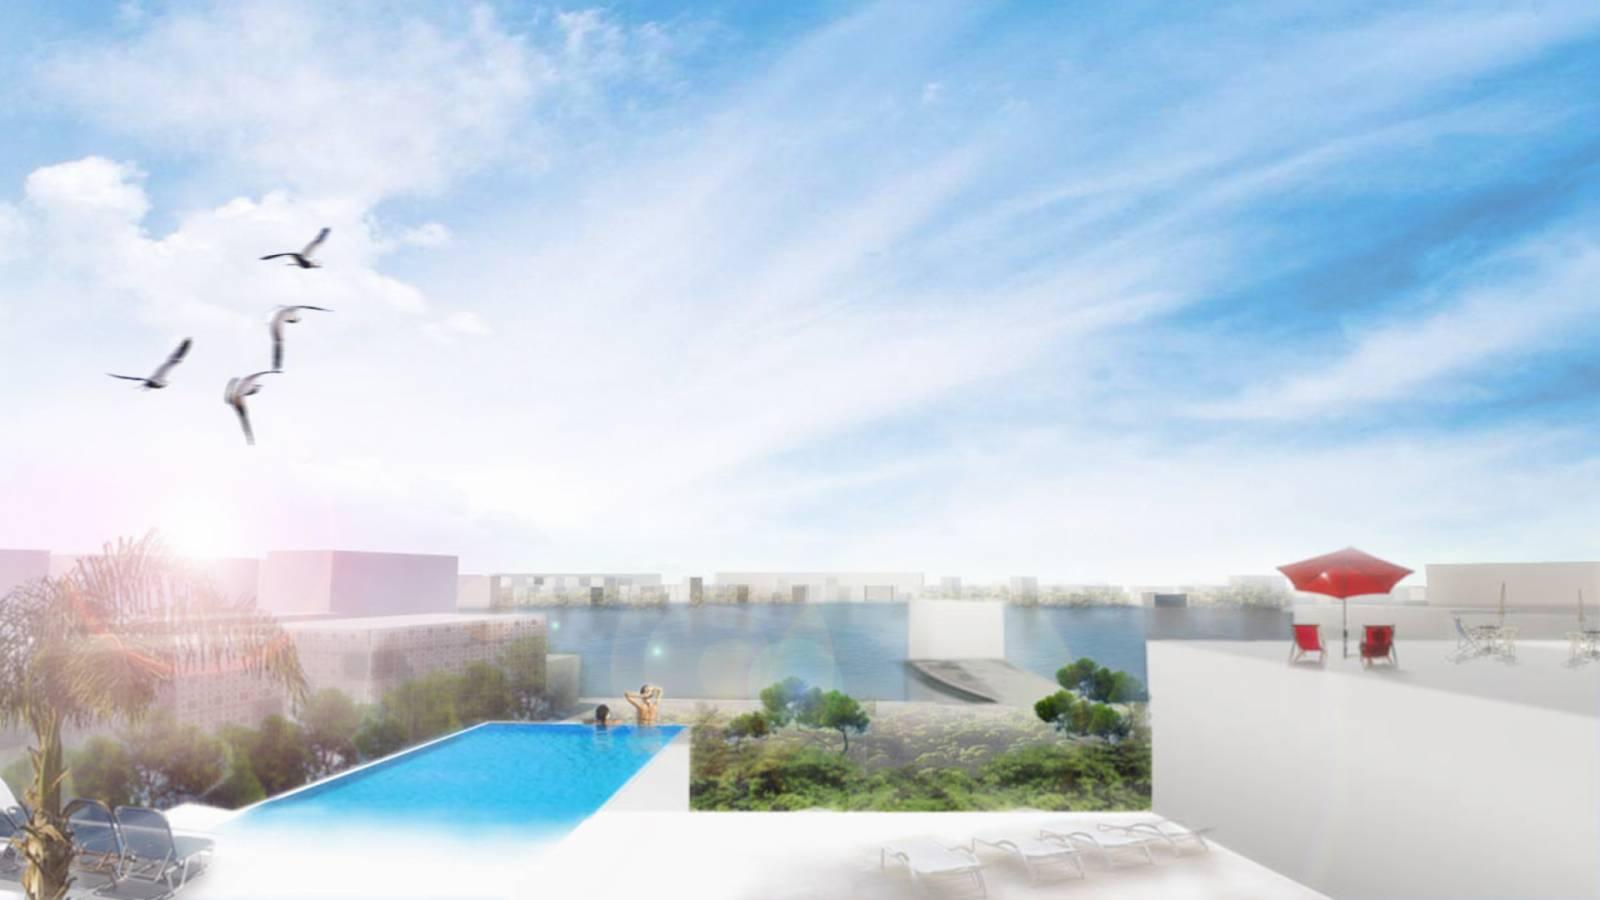 RADIAL LAKE VILLAGE VIEW - Velika Plaza Masterplan - SPOL Architects